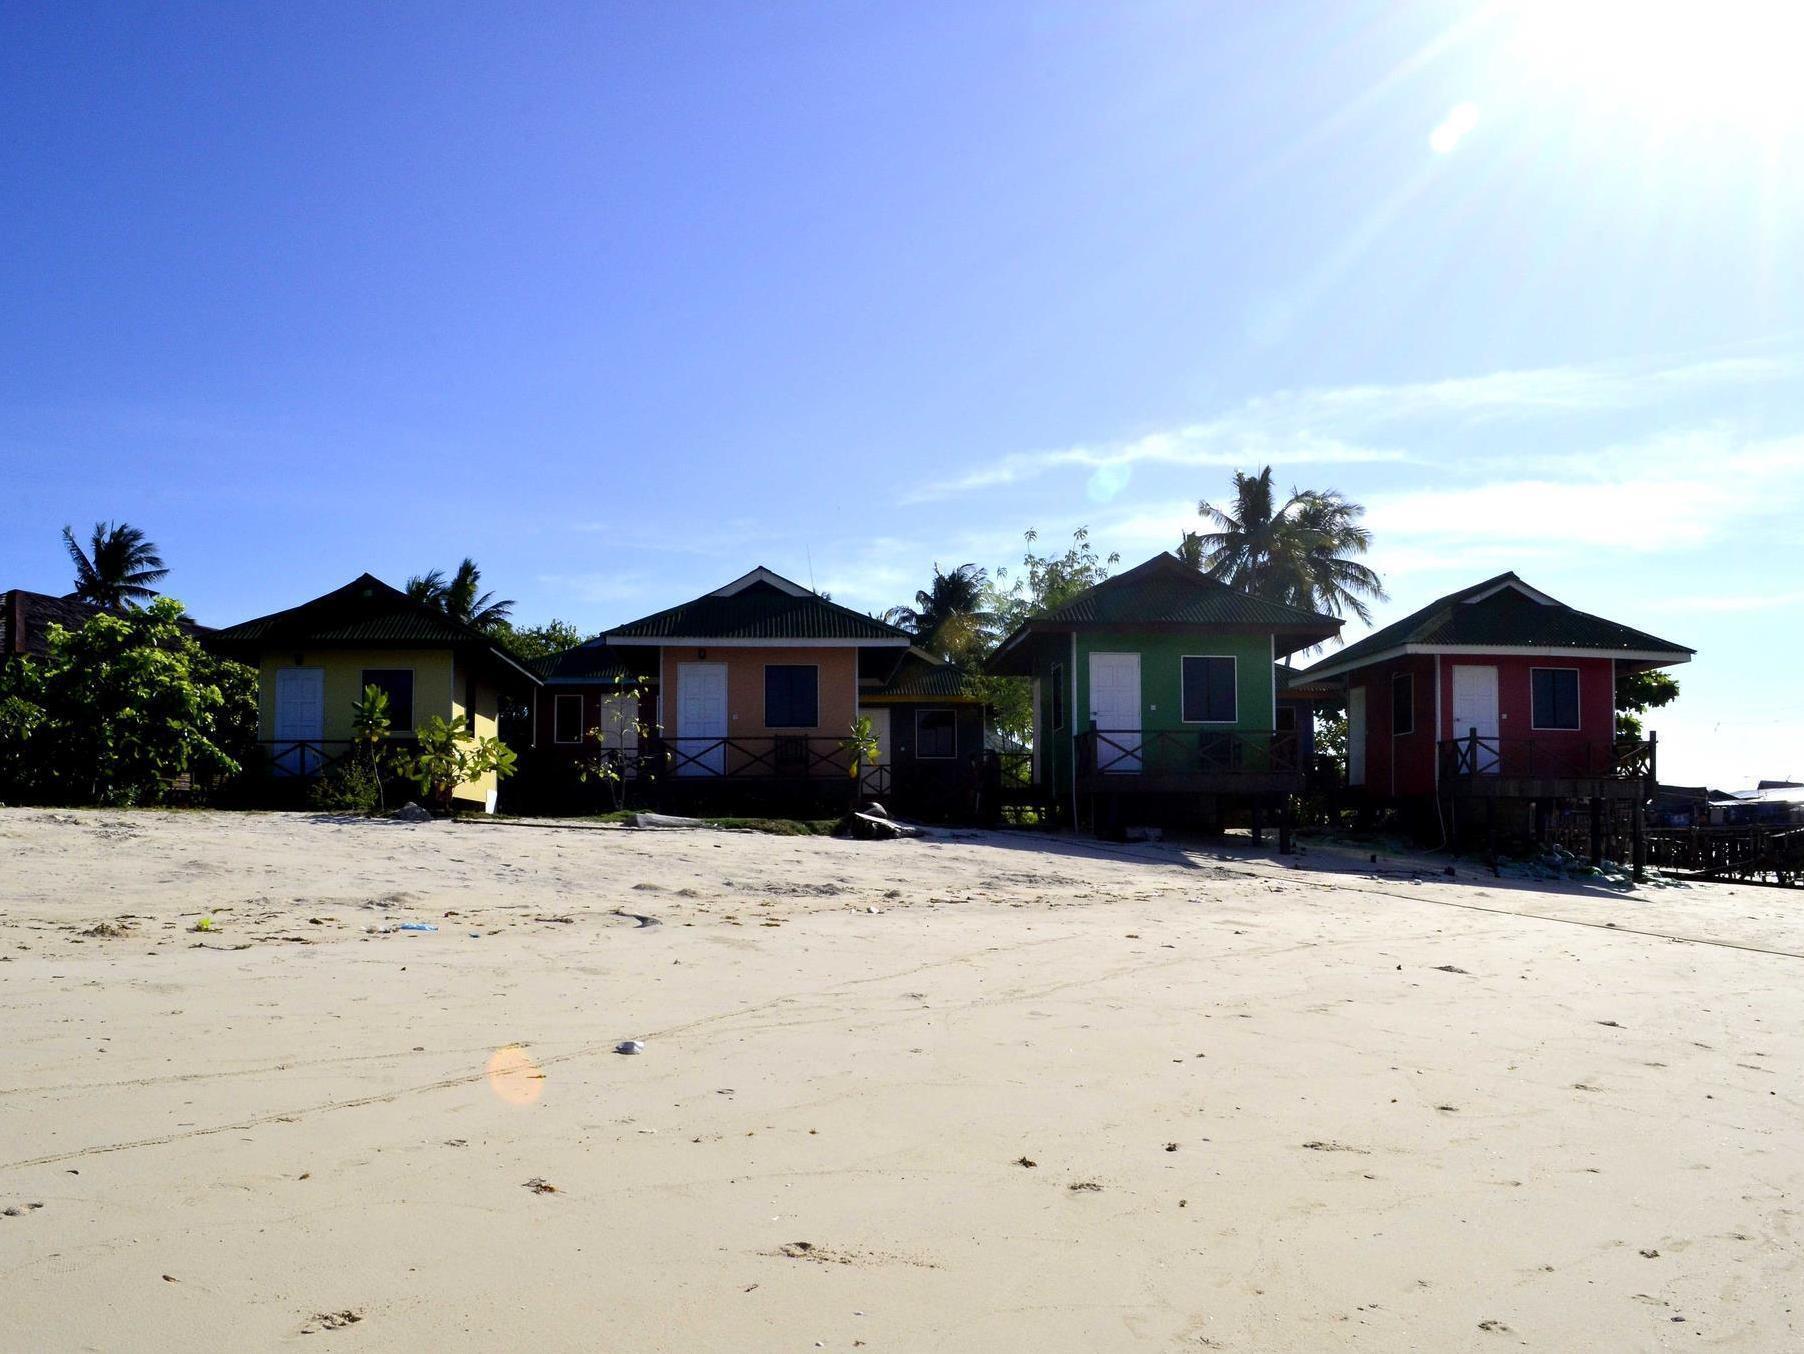 Sipadan dive centre mabul lodge mabul island semporna malaysia great discounted rates - Sipadan dive centre ...